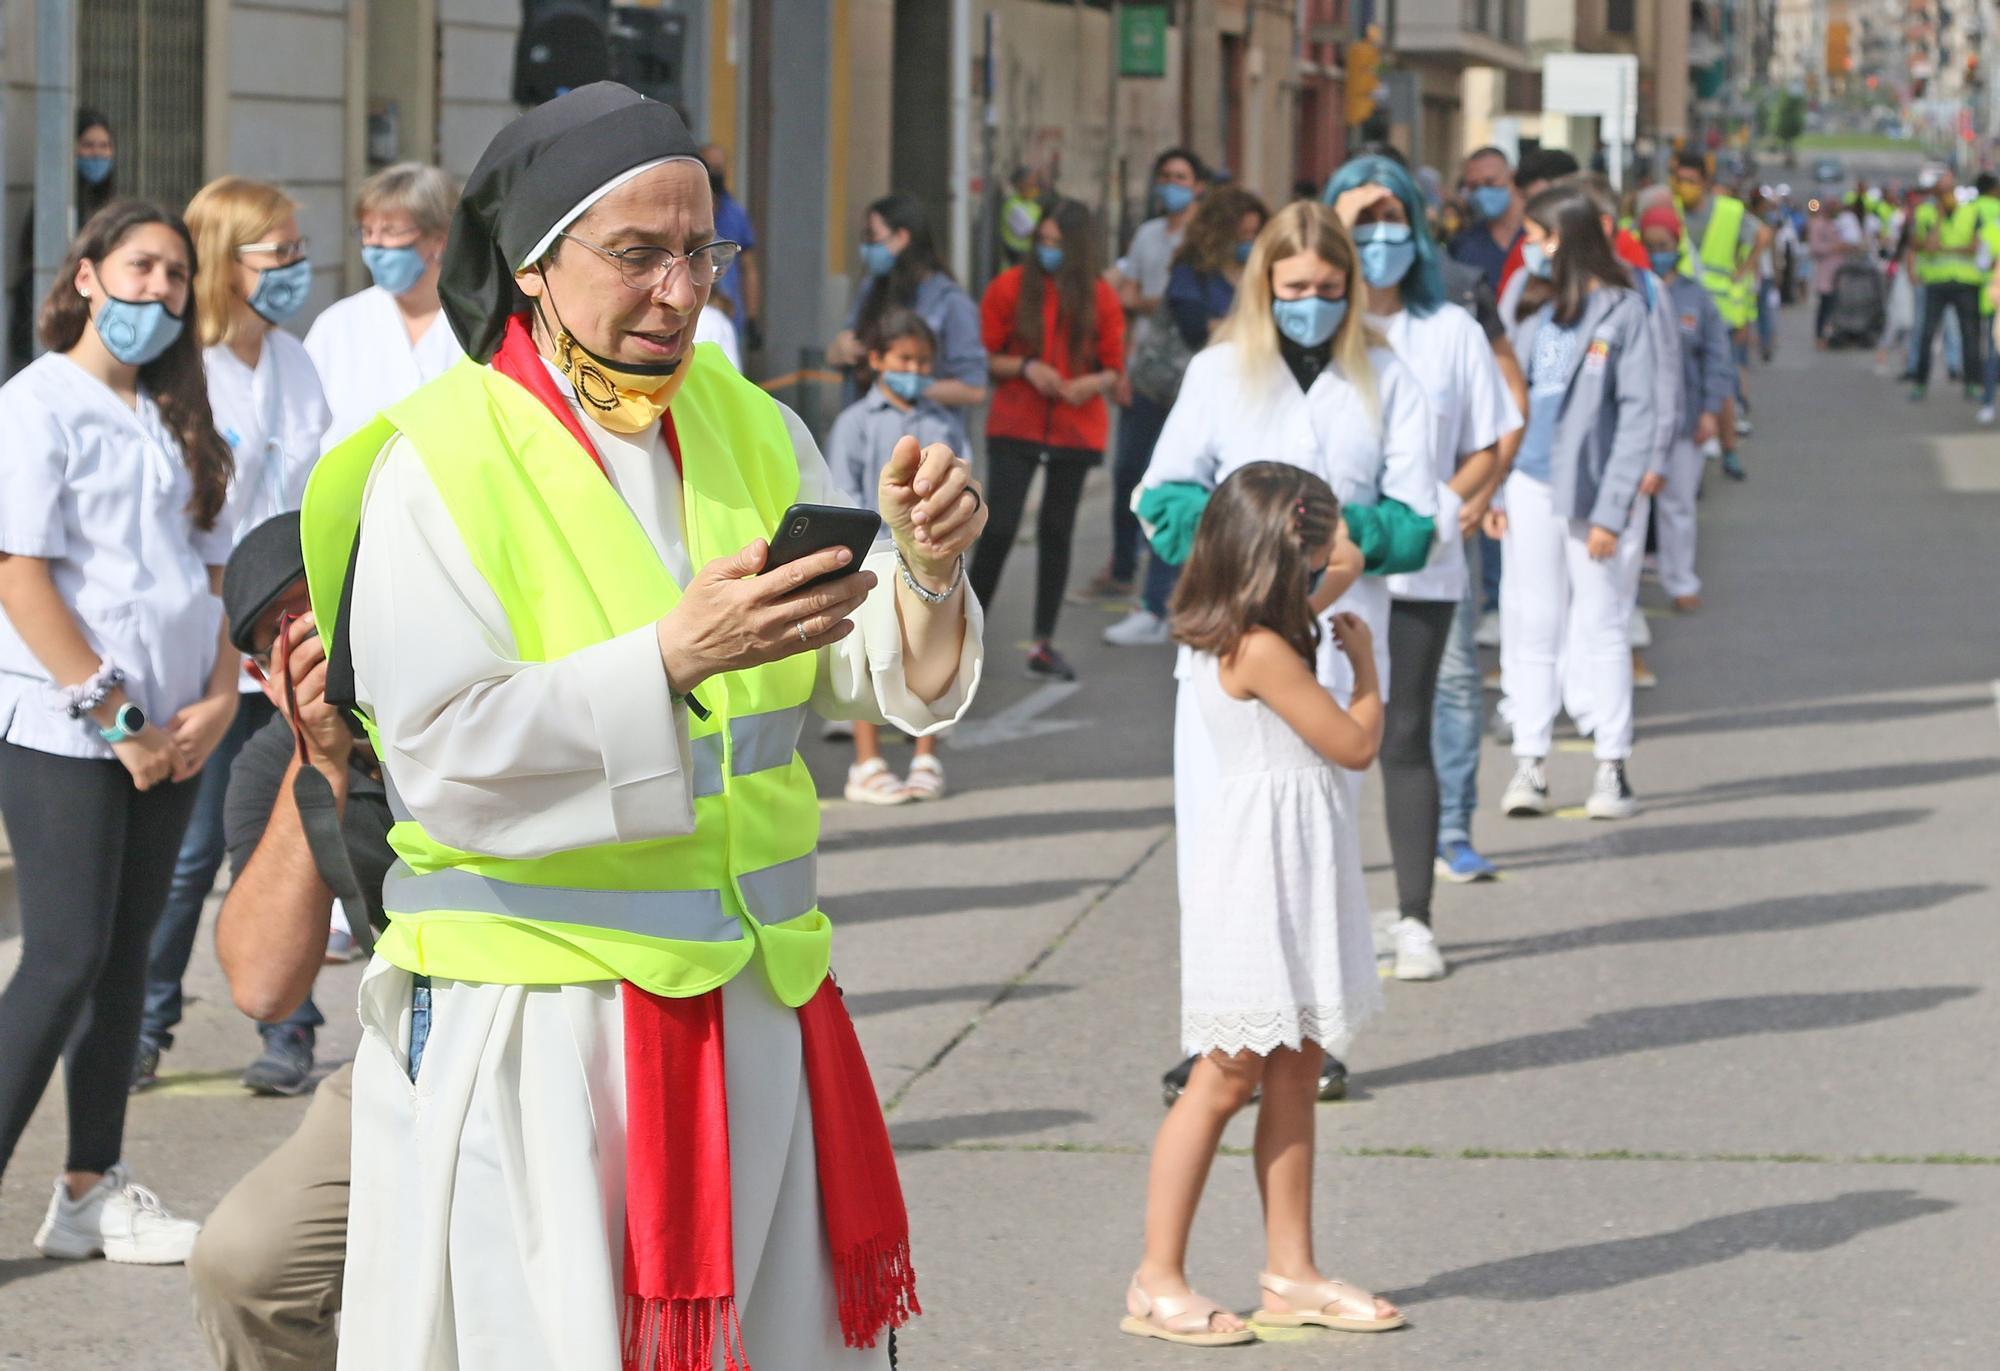 600 voluntaris fan un videoclip a Manresa en agraïment al personal sanitari